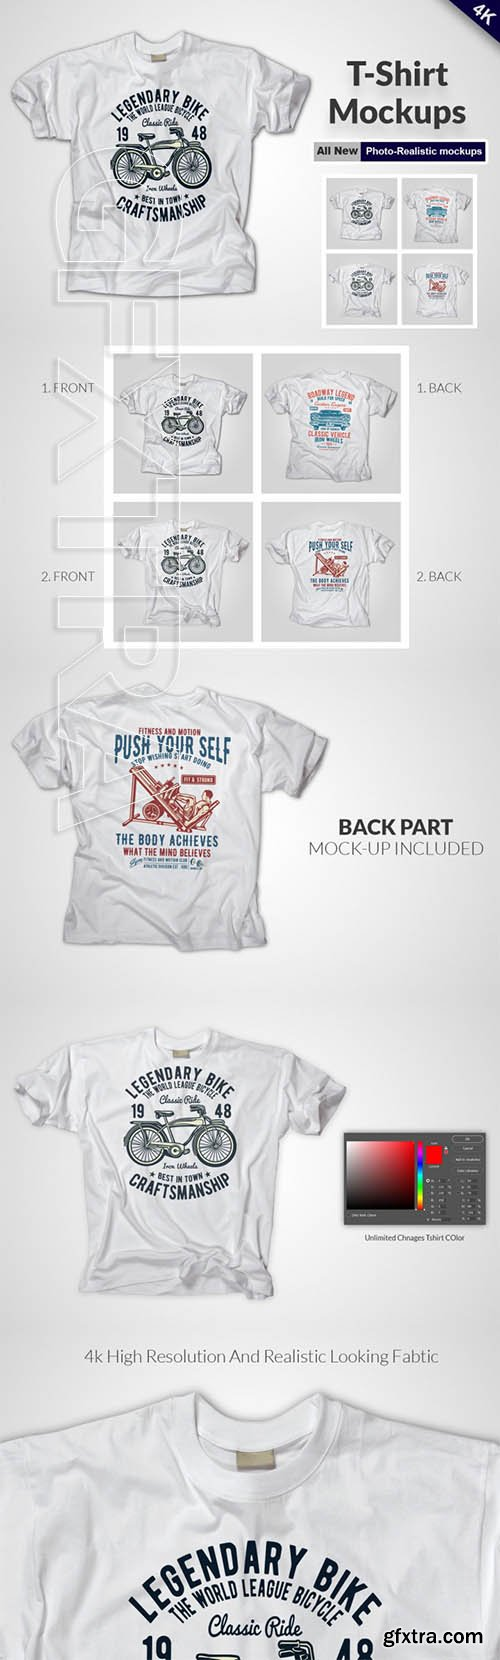 Apparel T-shirt Mock-up Set 3